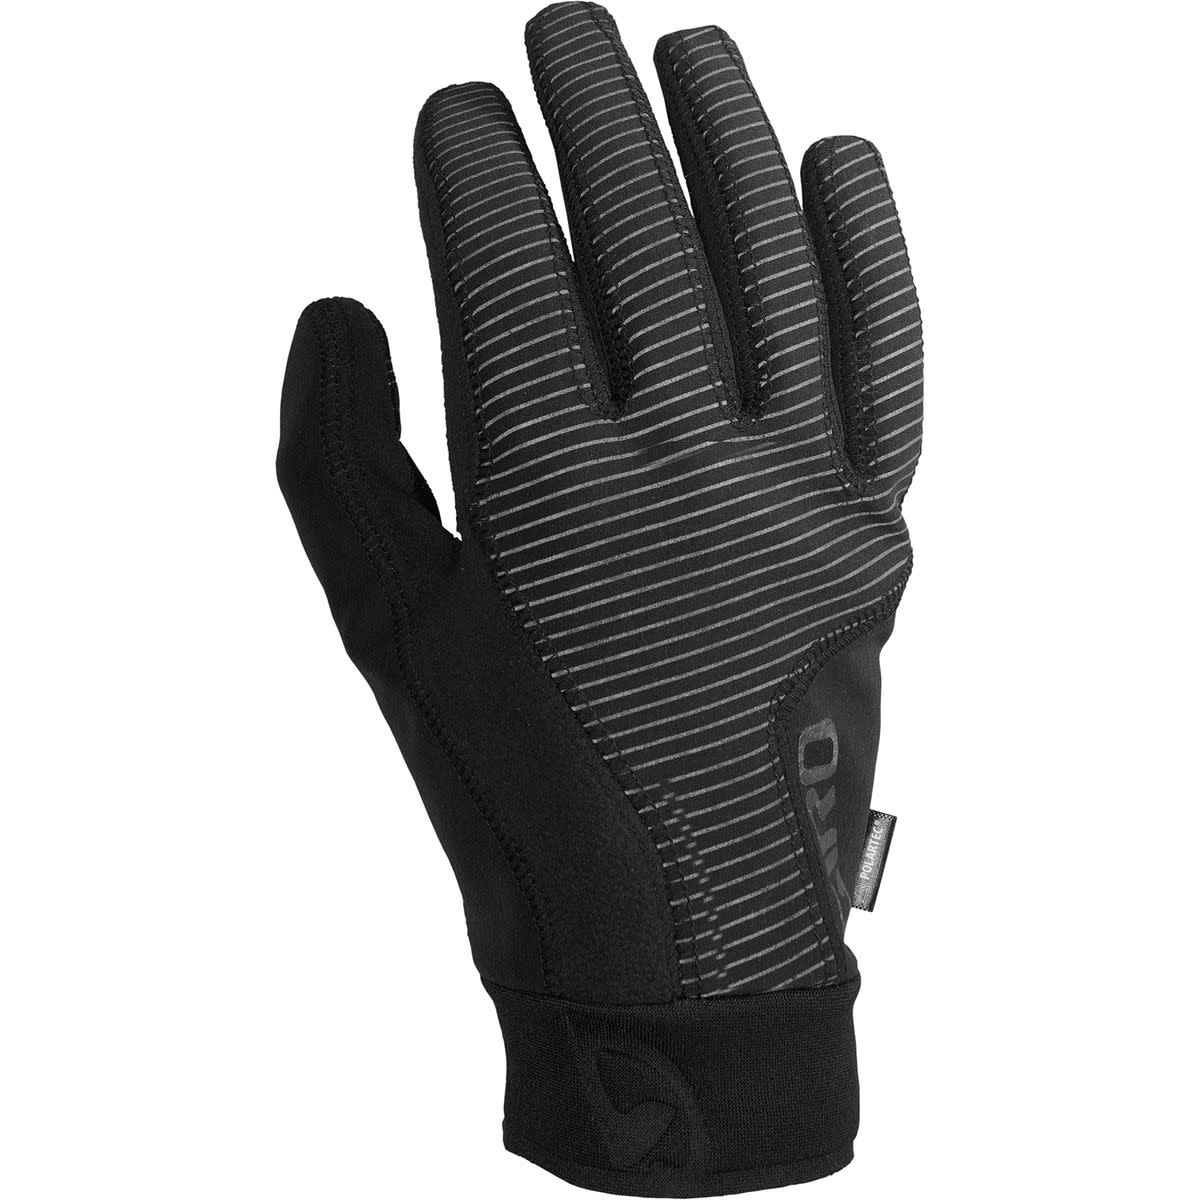 Giro Giro Blaze 2.0 Glove